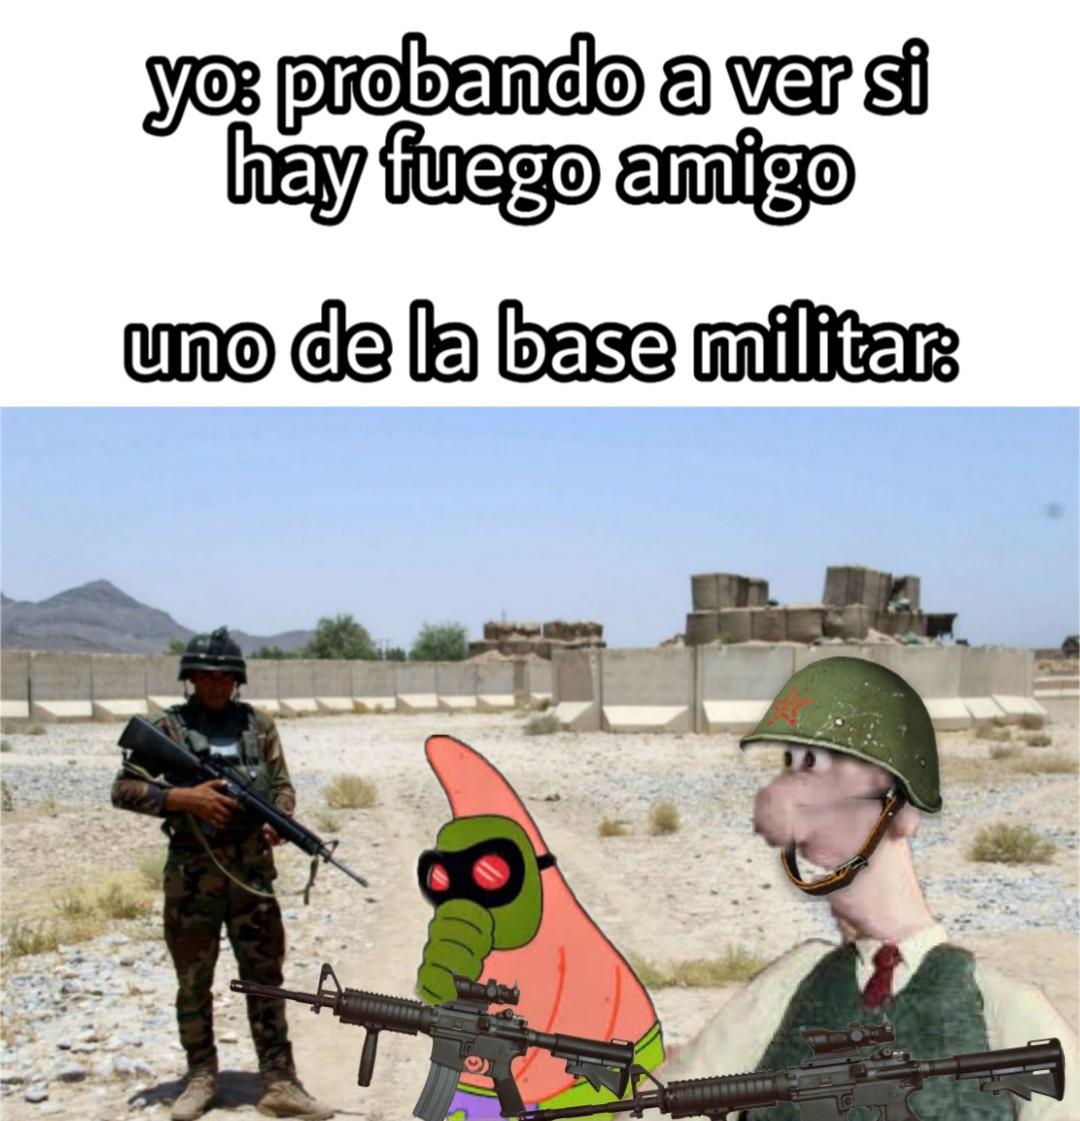 Yo, en todas las bases militares - meme